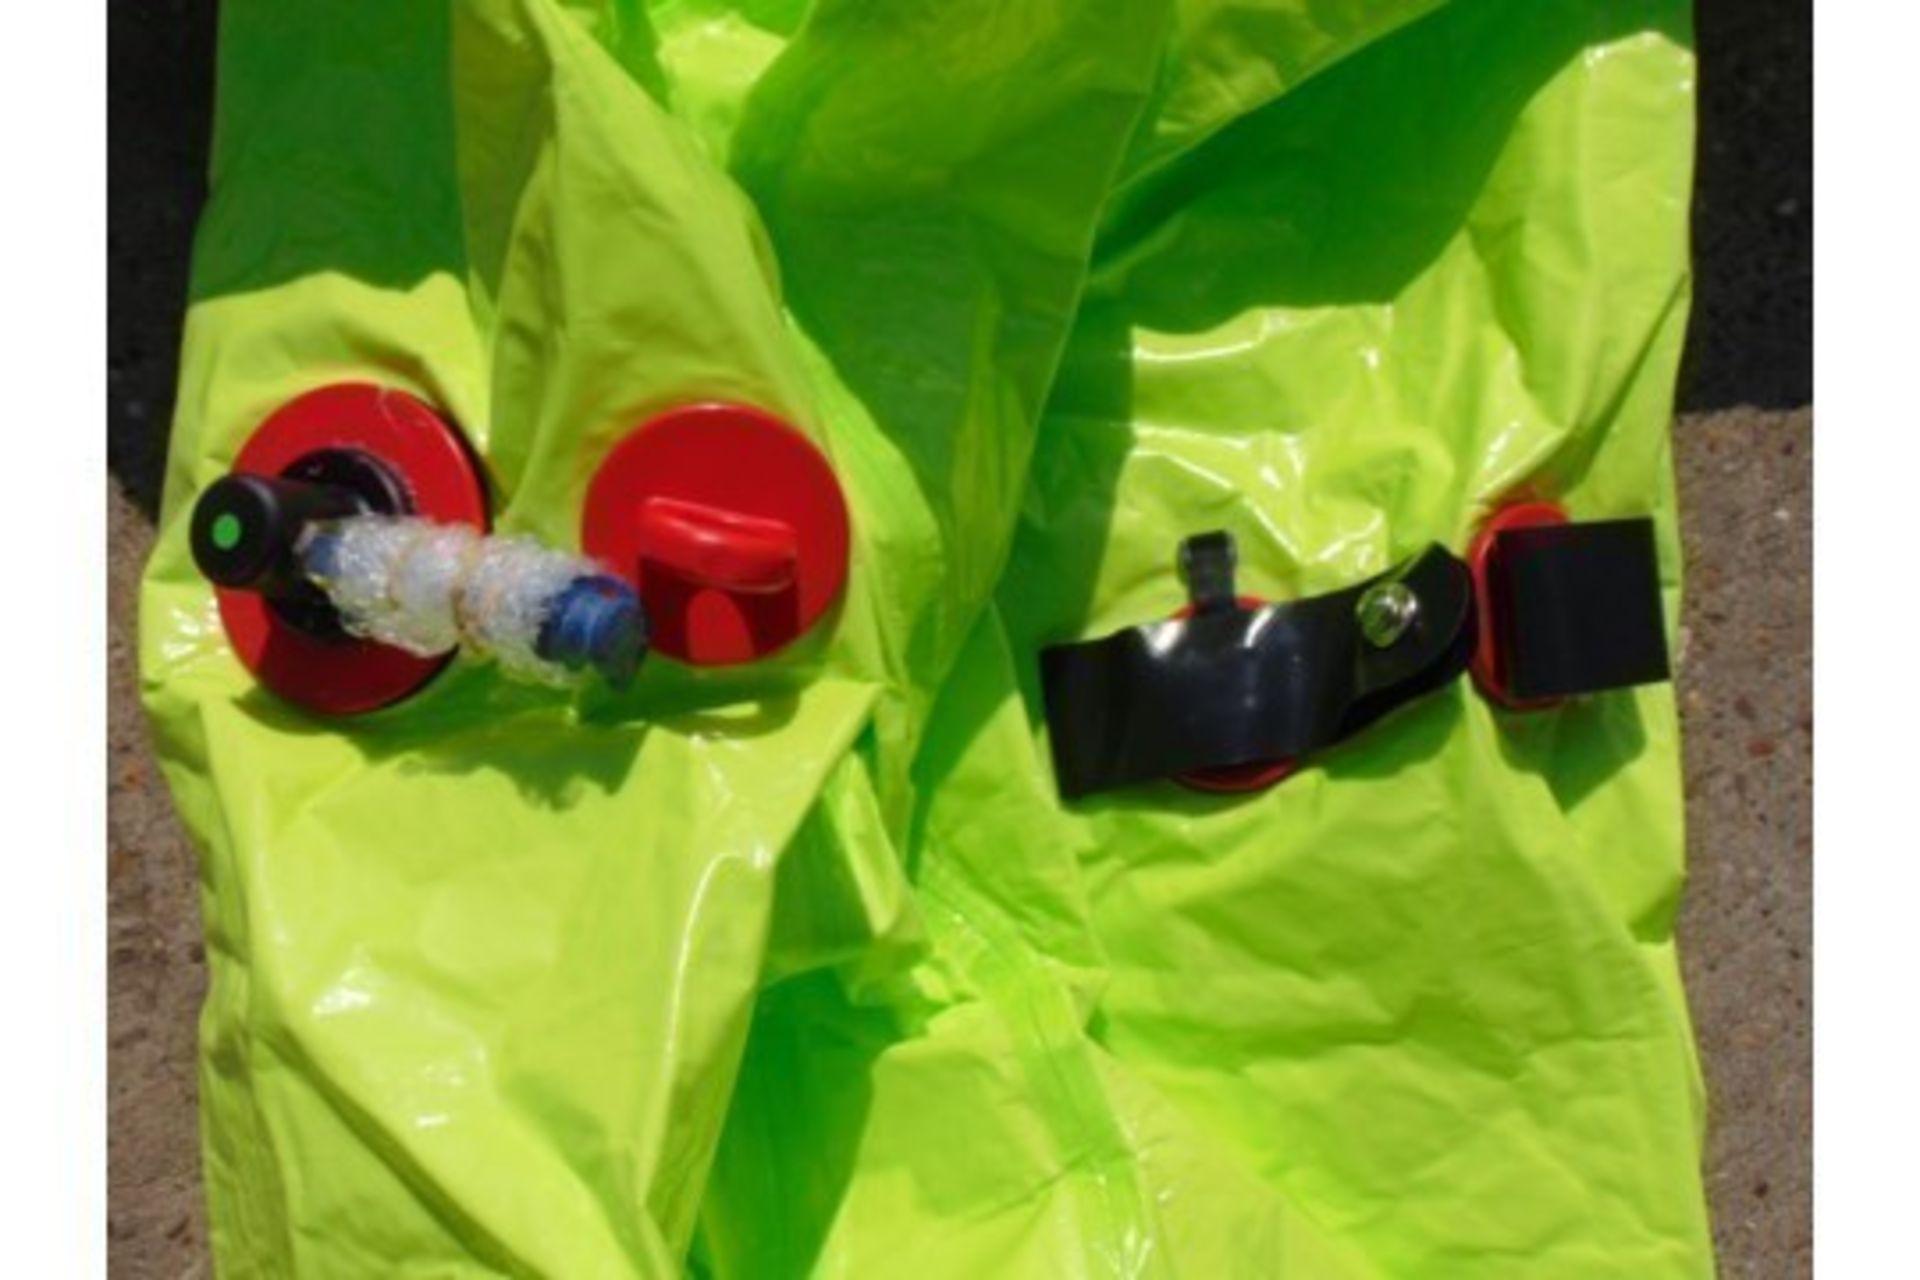 Lot 26807 - Q10 x Unissued Respirex Tychem TK Gas-Tight Hazmat Suit. Size XL